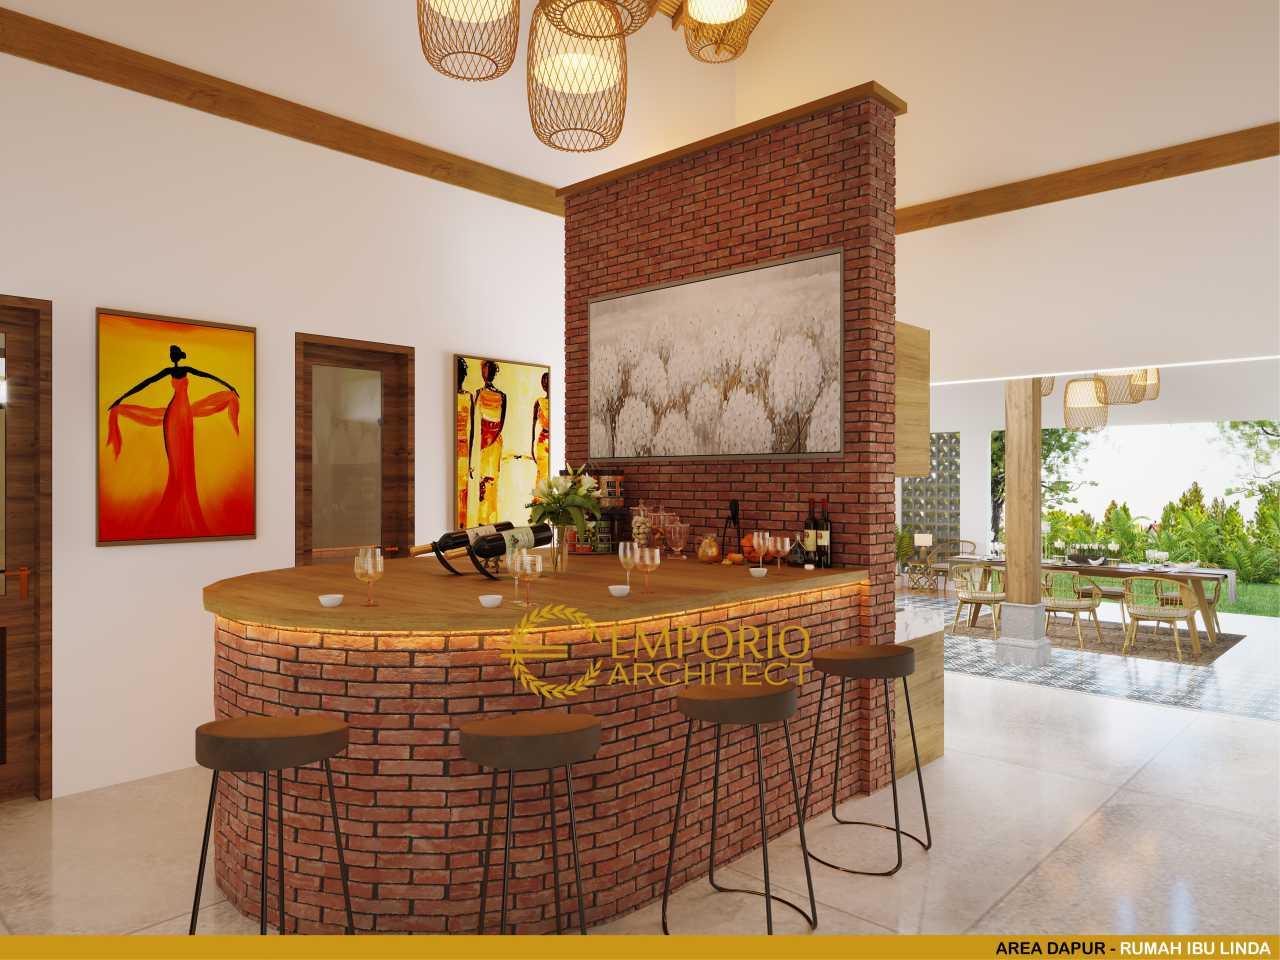 Ide Desain Interior Dapur Minimalis Sederhana Berkonsep Vintage